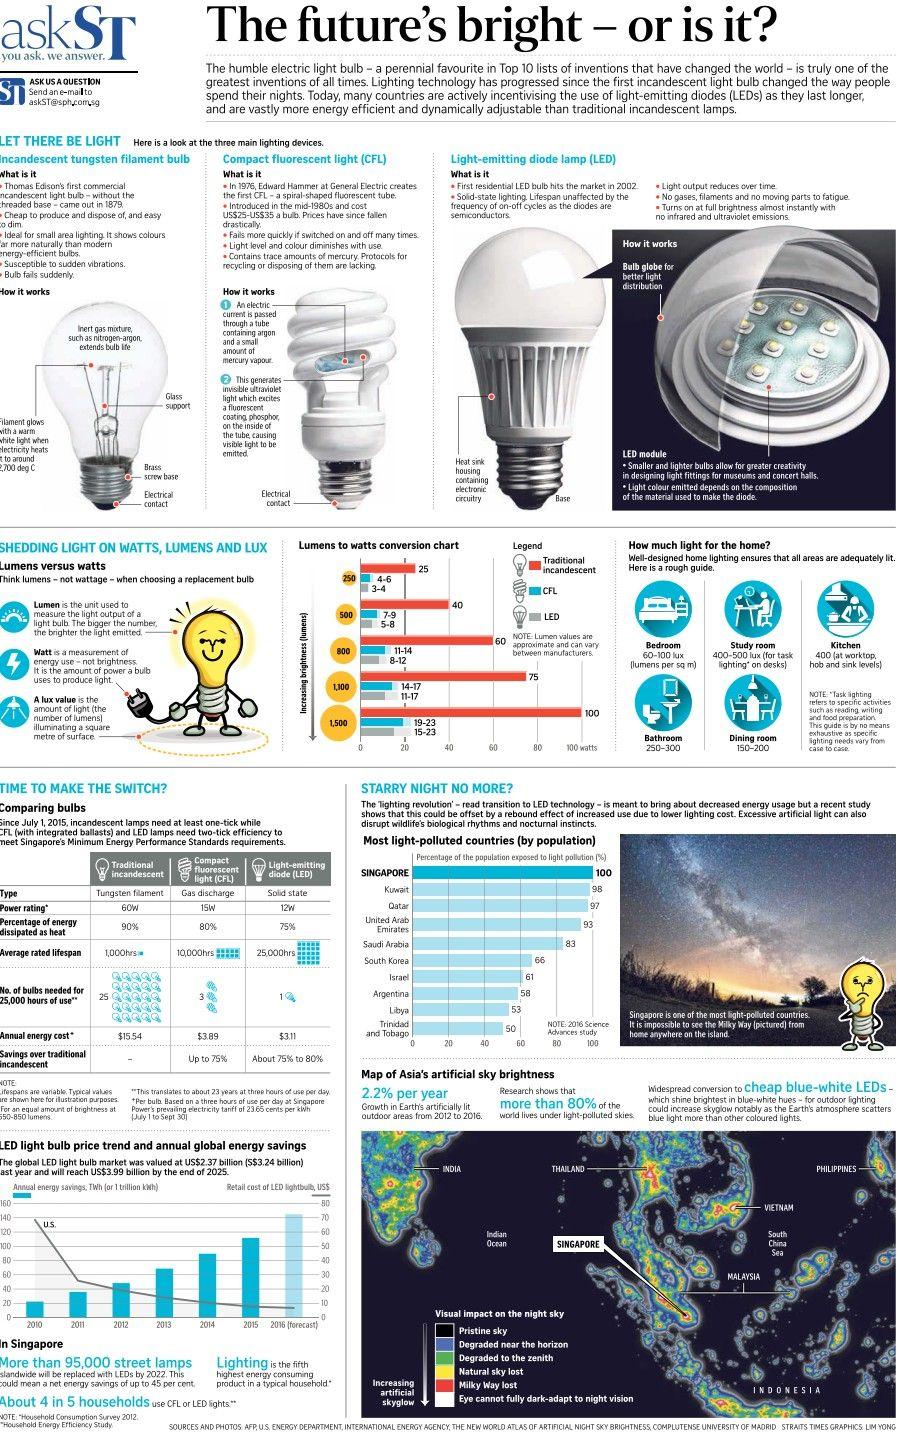 Pin By Meng Yeong On Science Mathematics Formulae Led Light Bulb Light Bulb Bulb